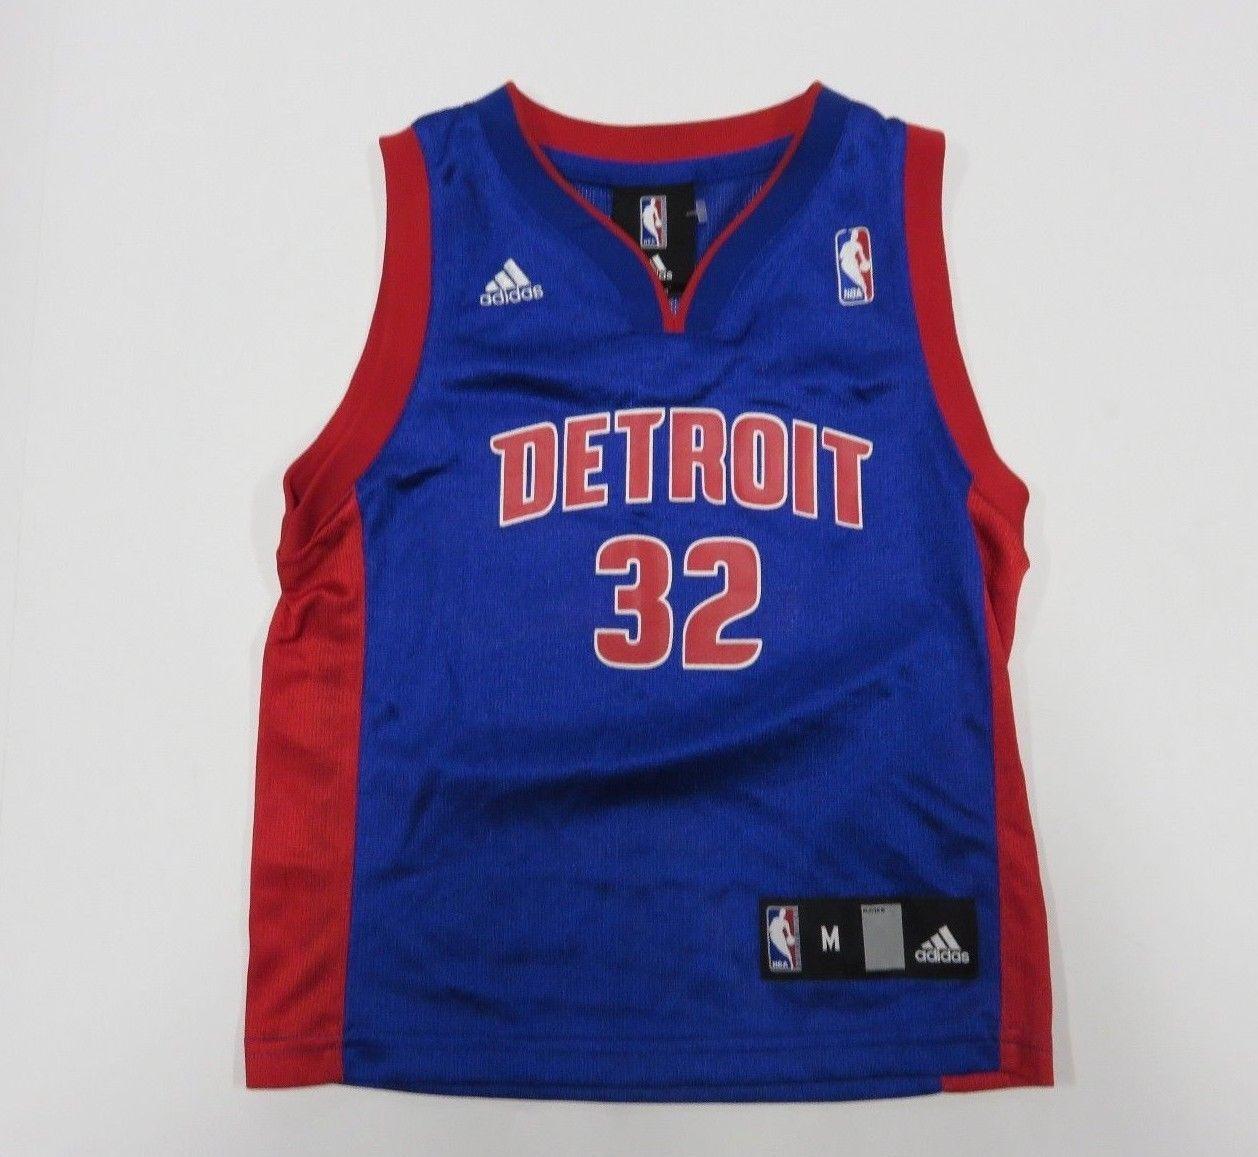 f4e874fdc Adidas NBA Detroit Pistons Richard Hamilton and 50 similar items